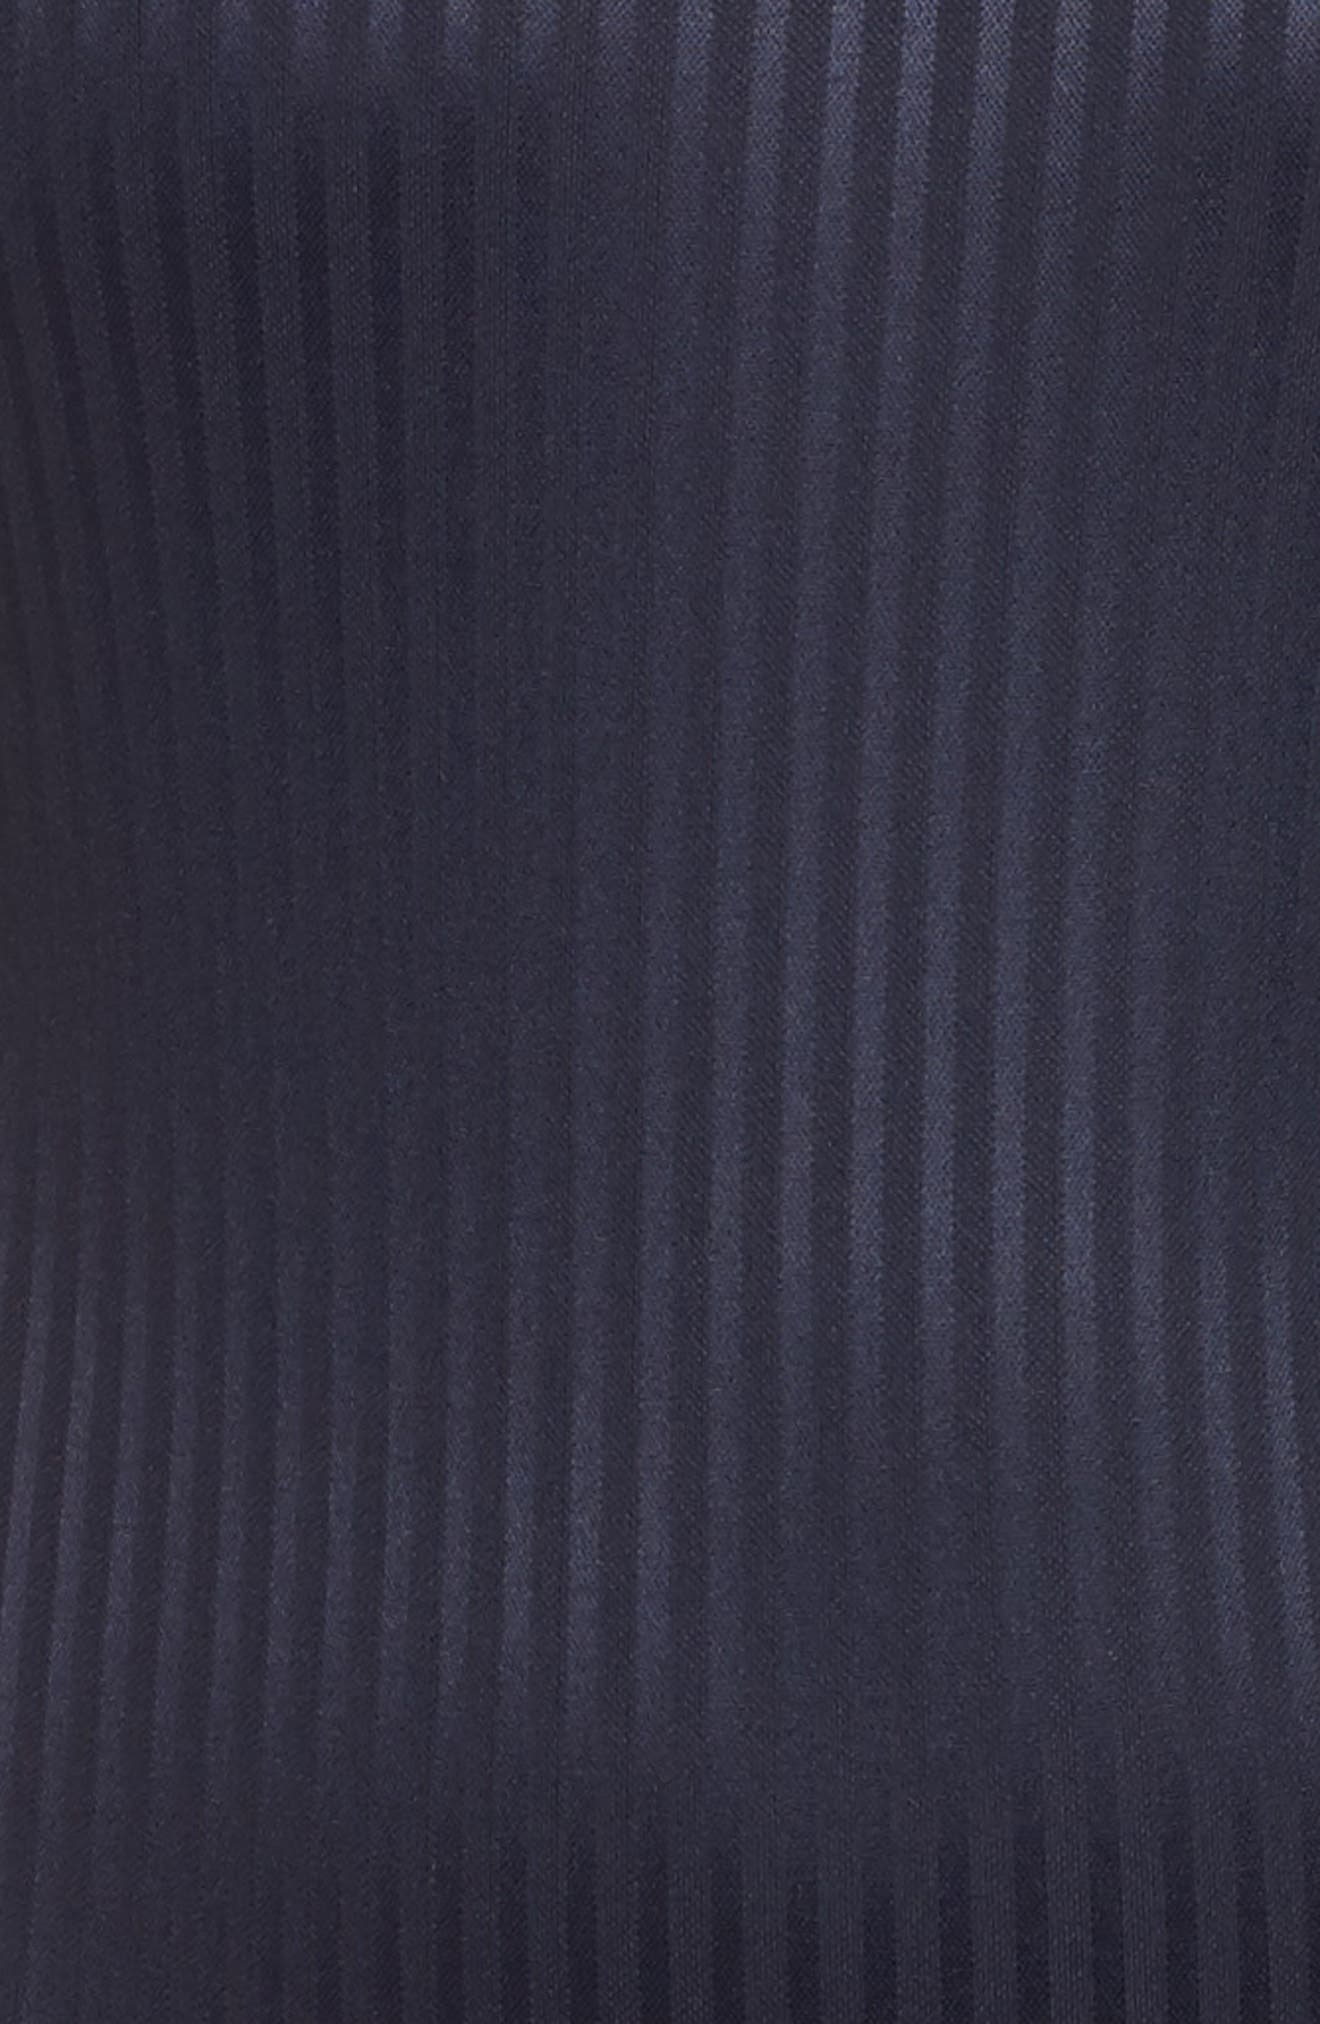 FENTY PUMA by Rihanna Bodysuit,                             Alternate thumbnail 5, color,                             Navy